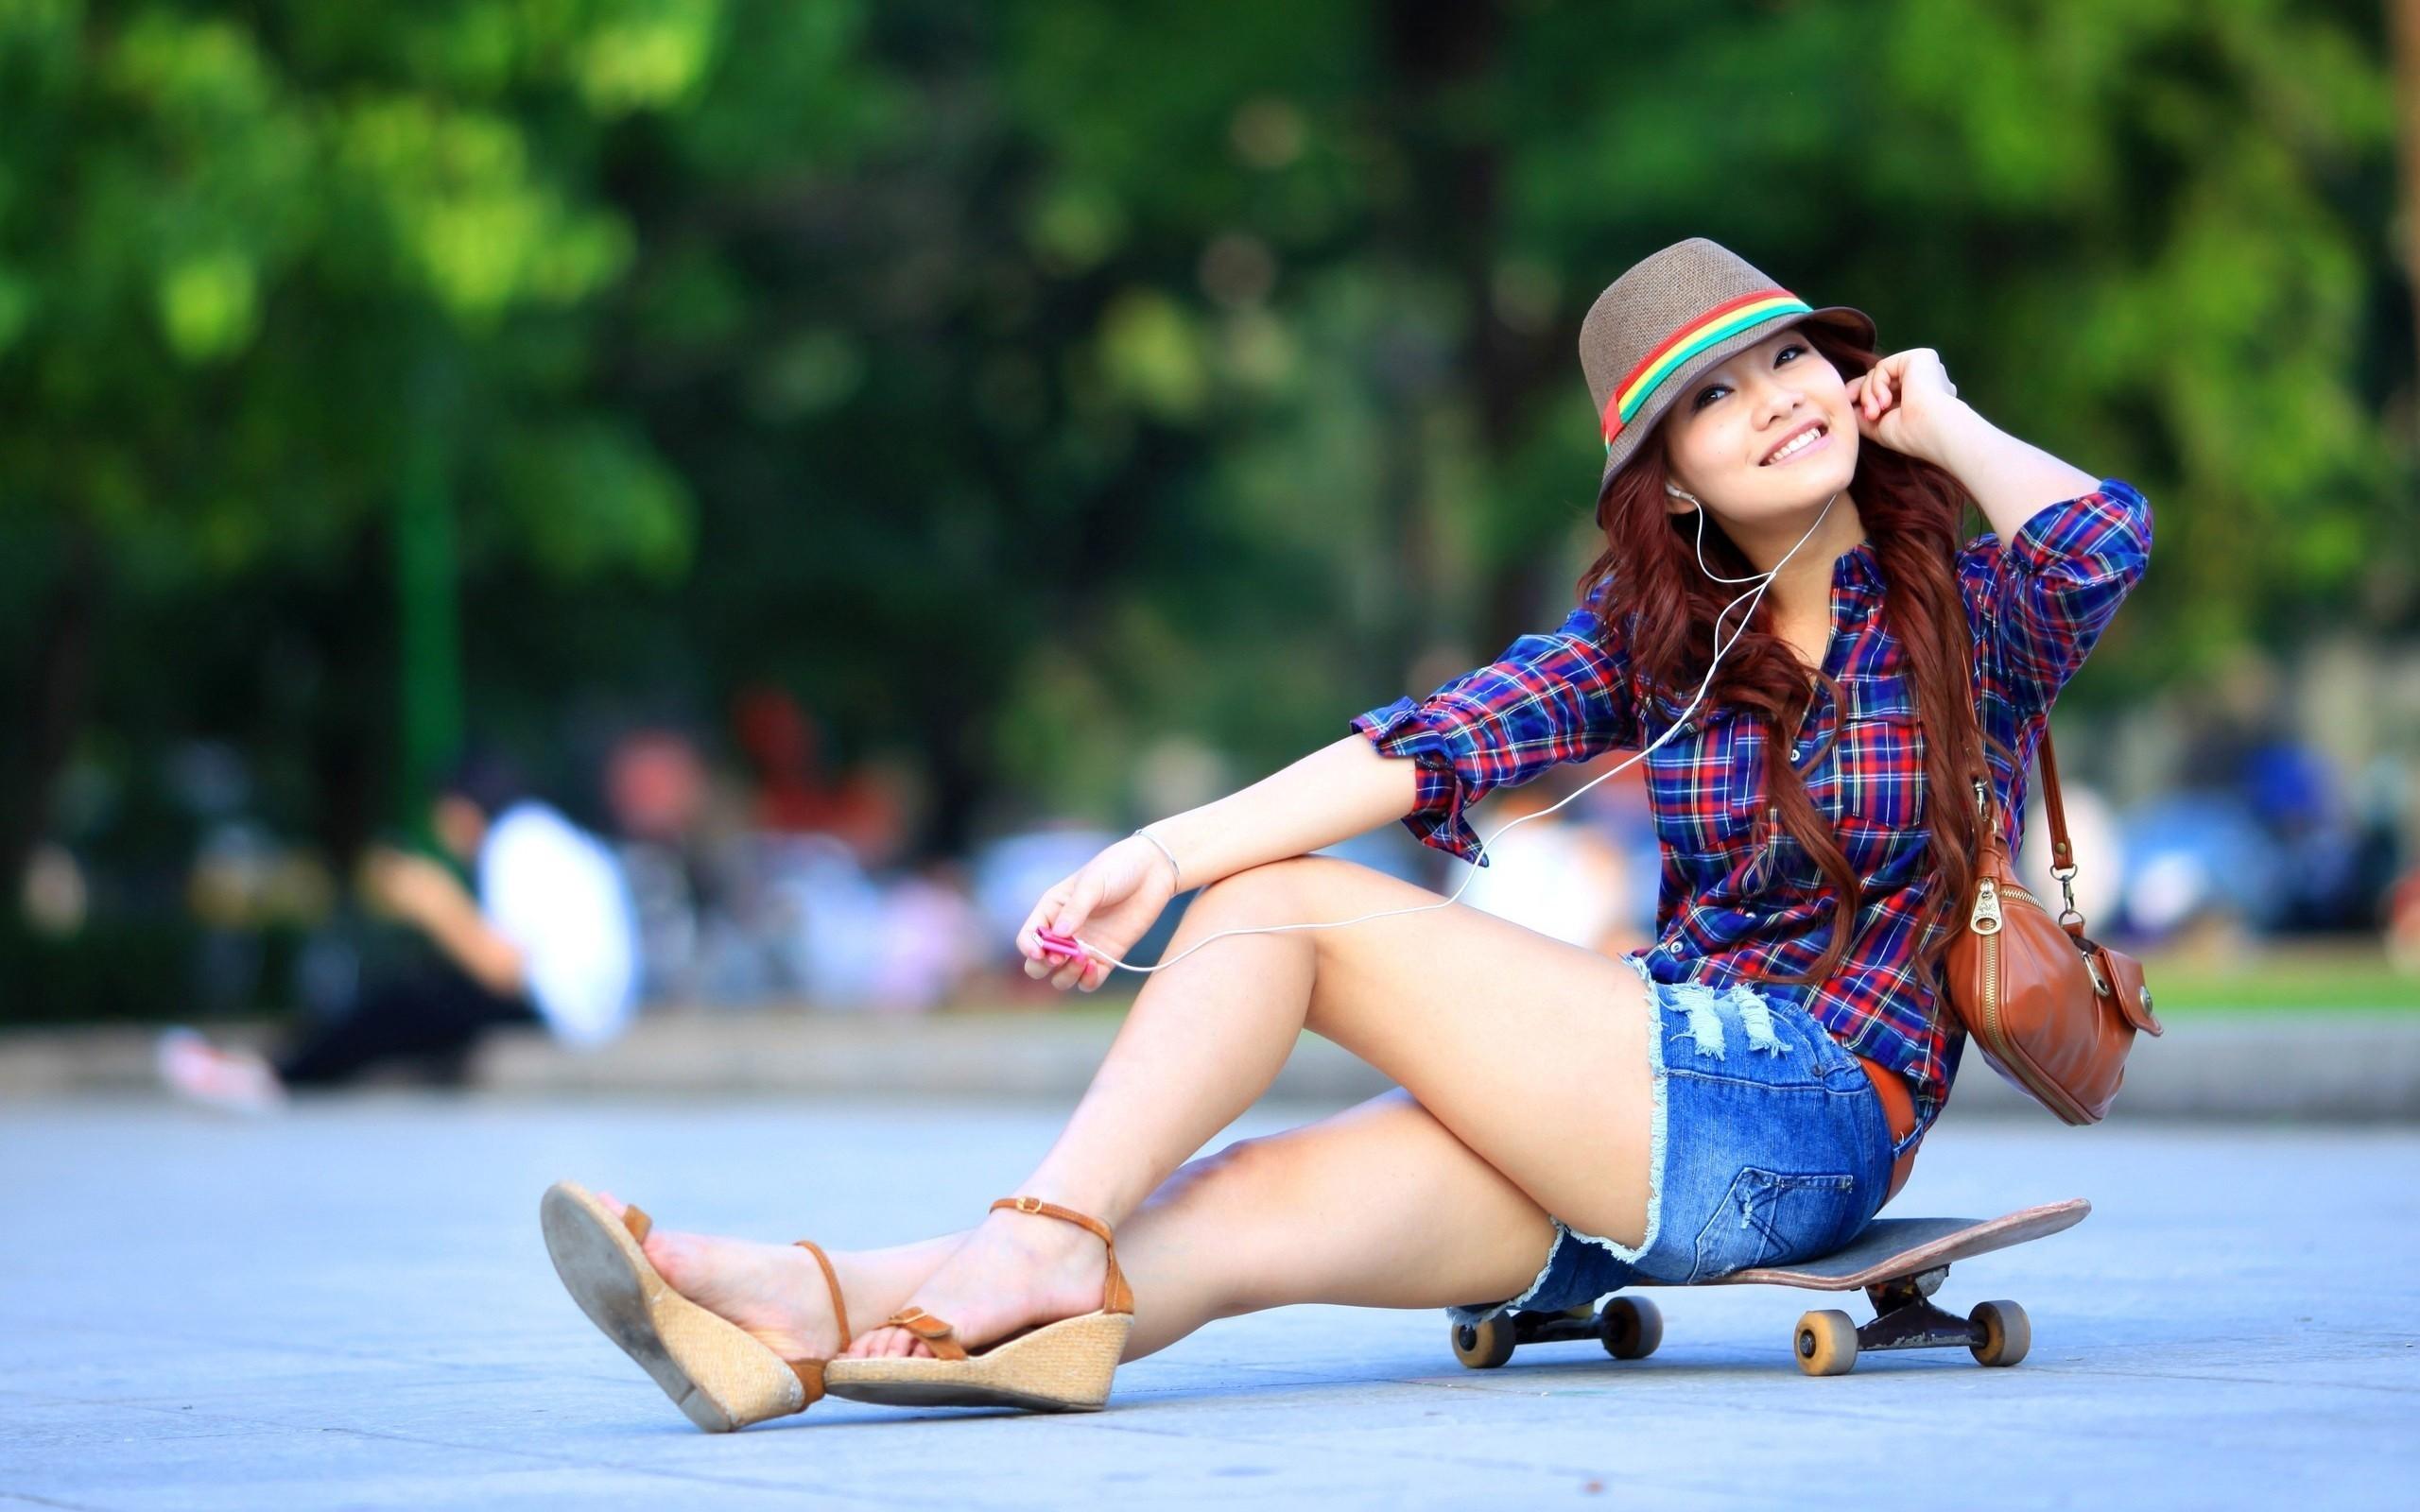 … Girl sitting on a skateboard